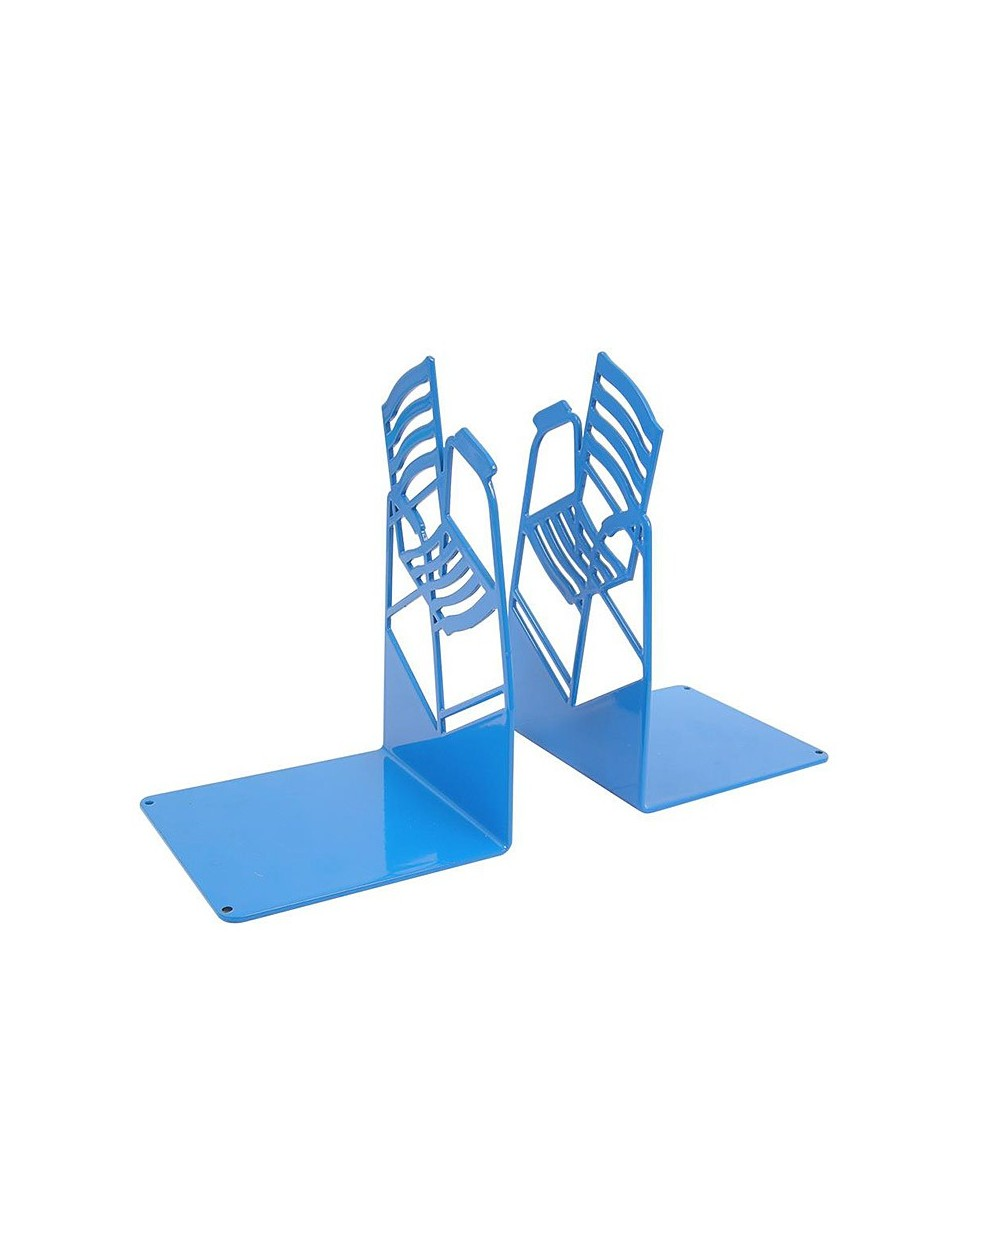 2 chaises serre-livre